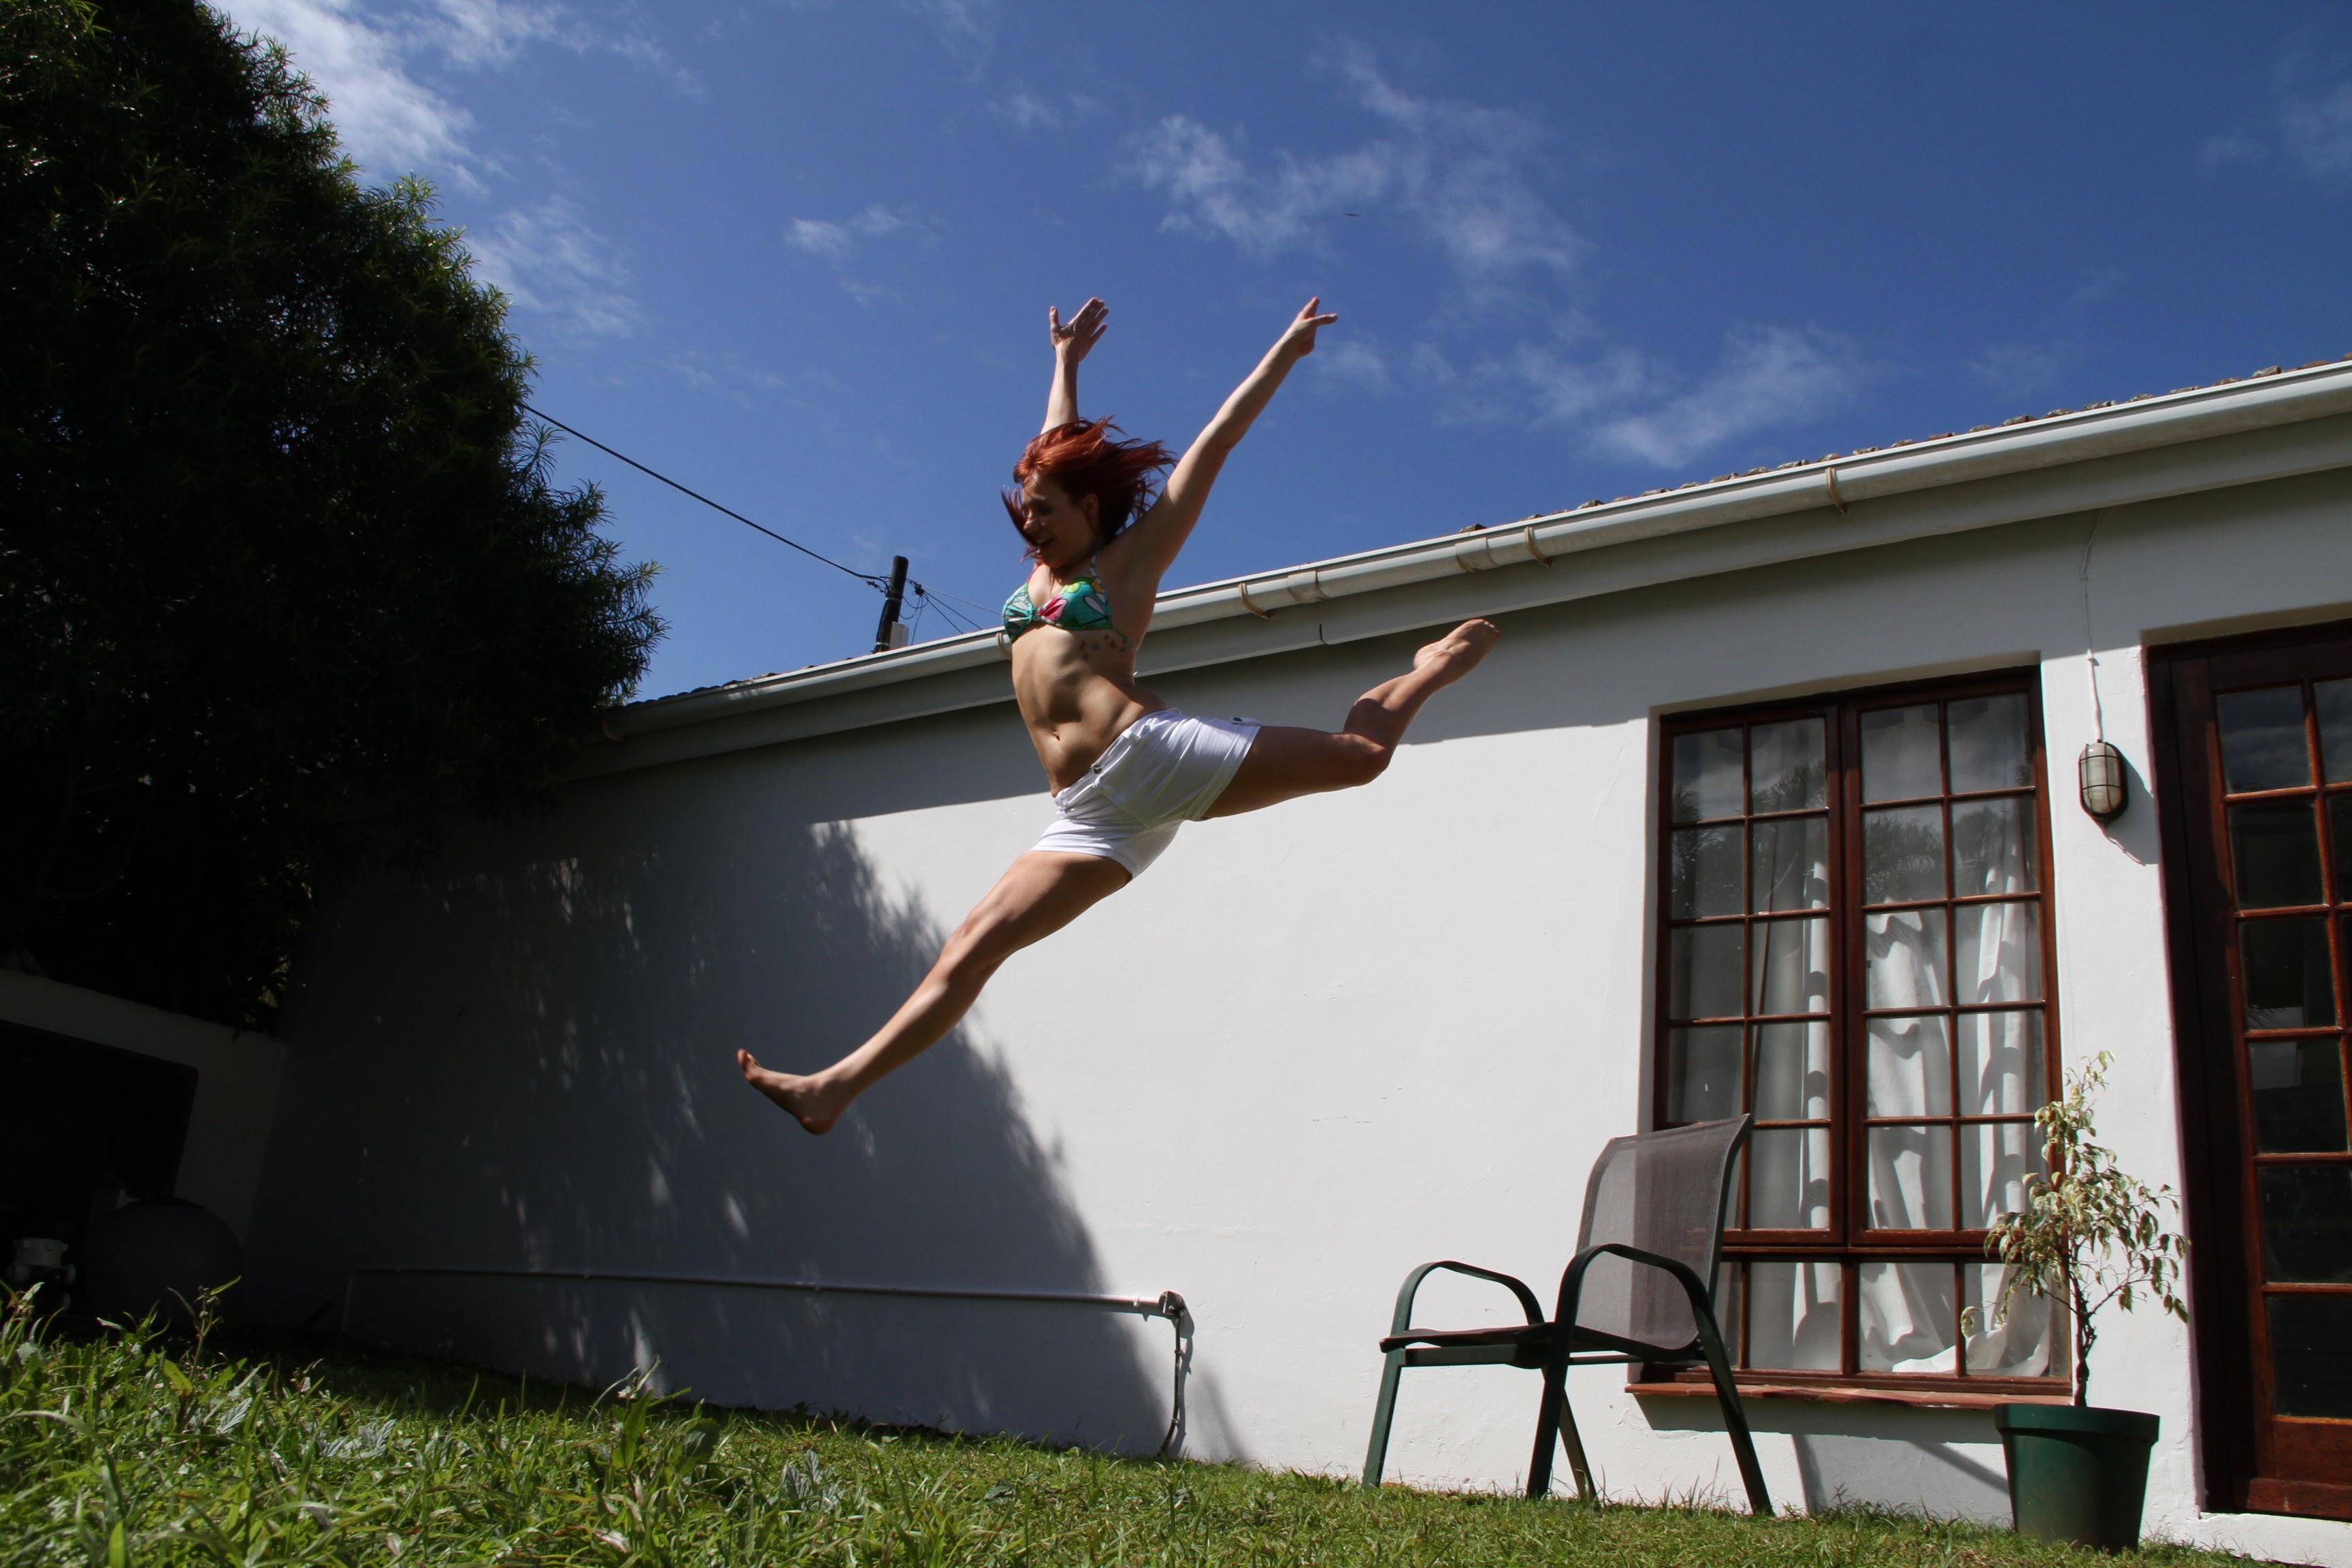 yoga jump be free